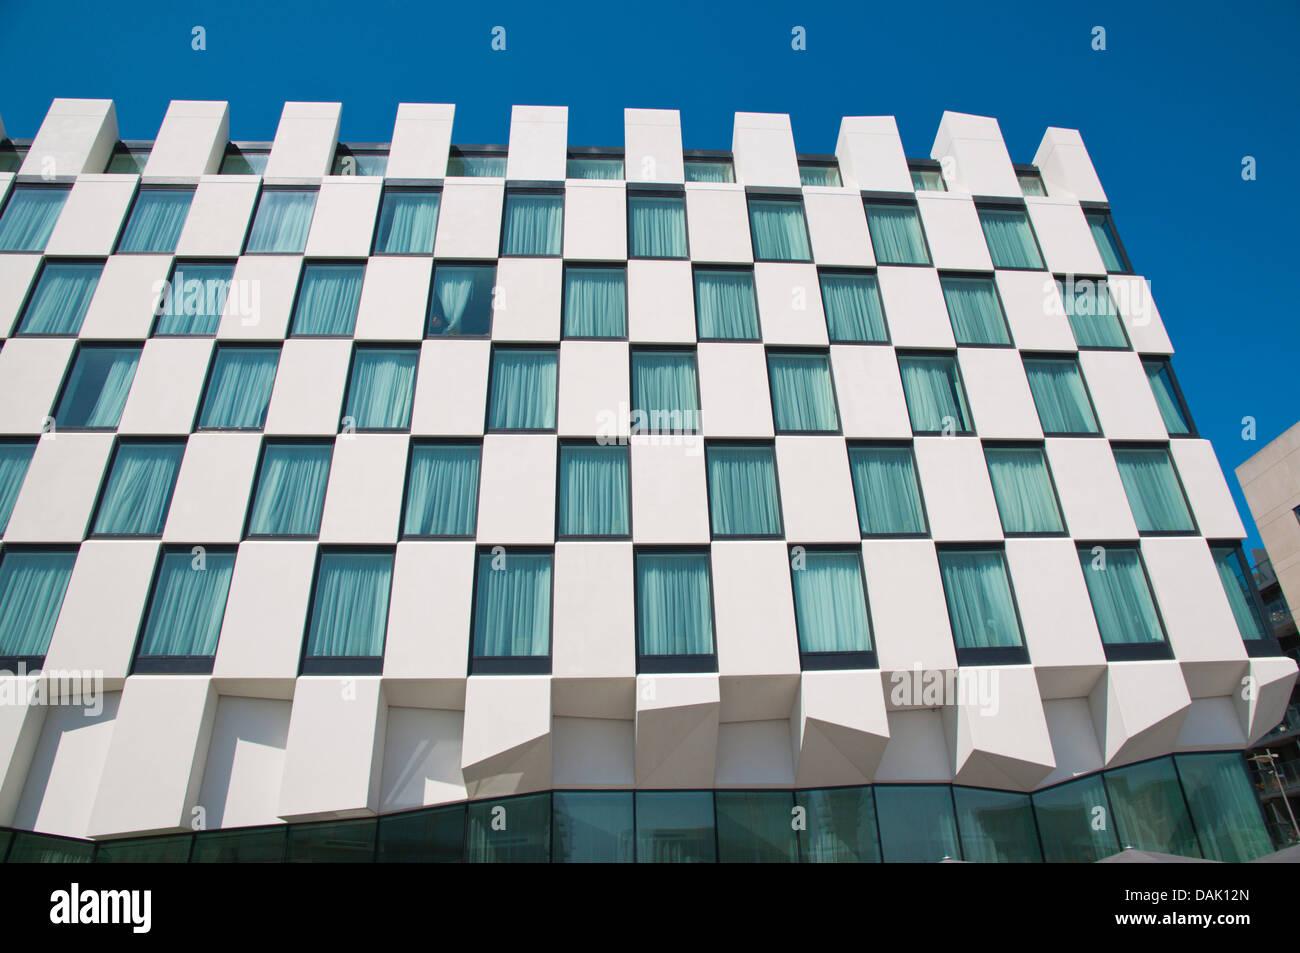 The Marker building Docklands former harbour area central Dublin Ireland Europe - Stock Image